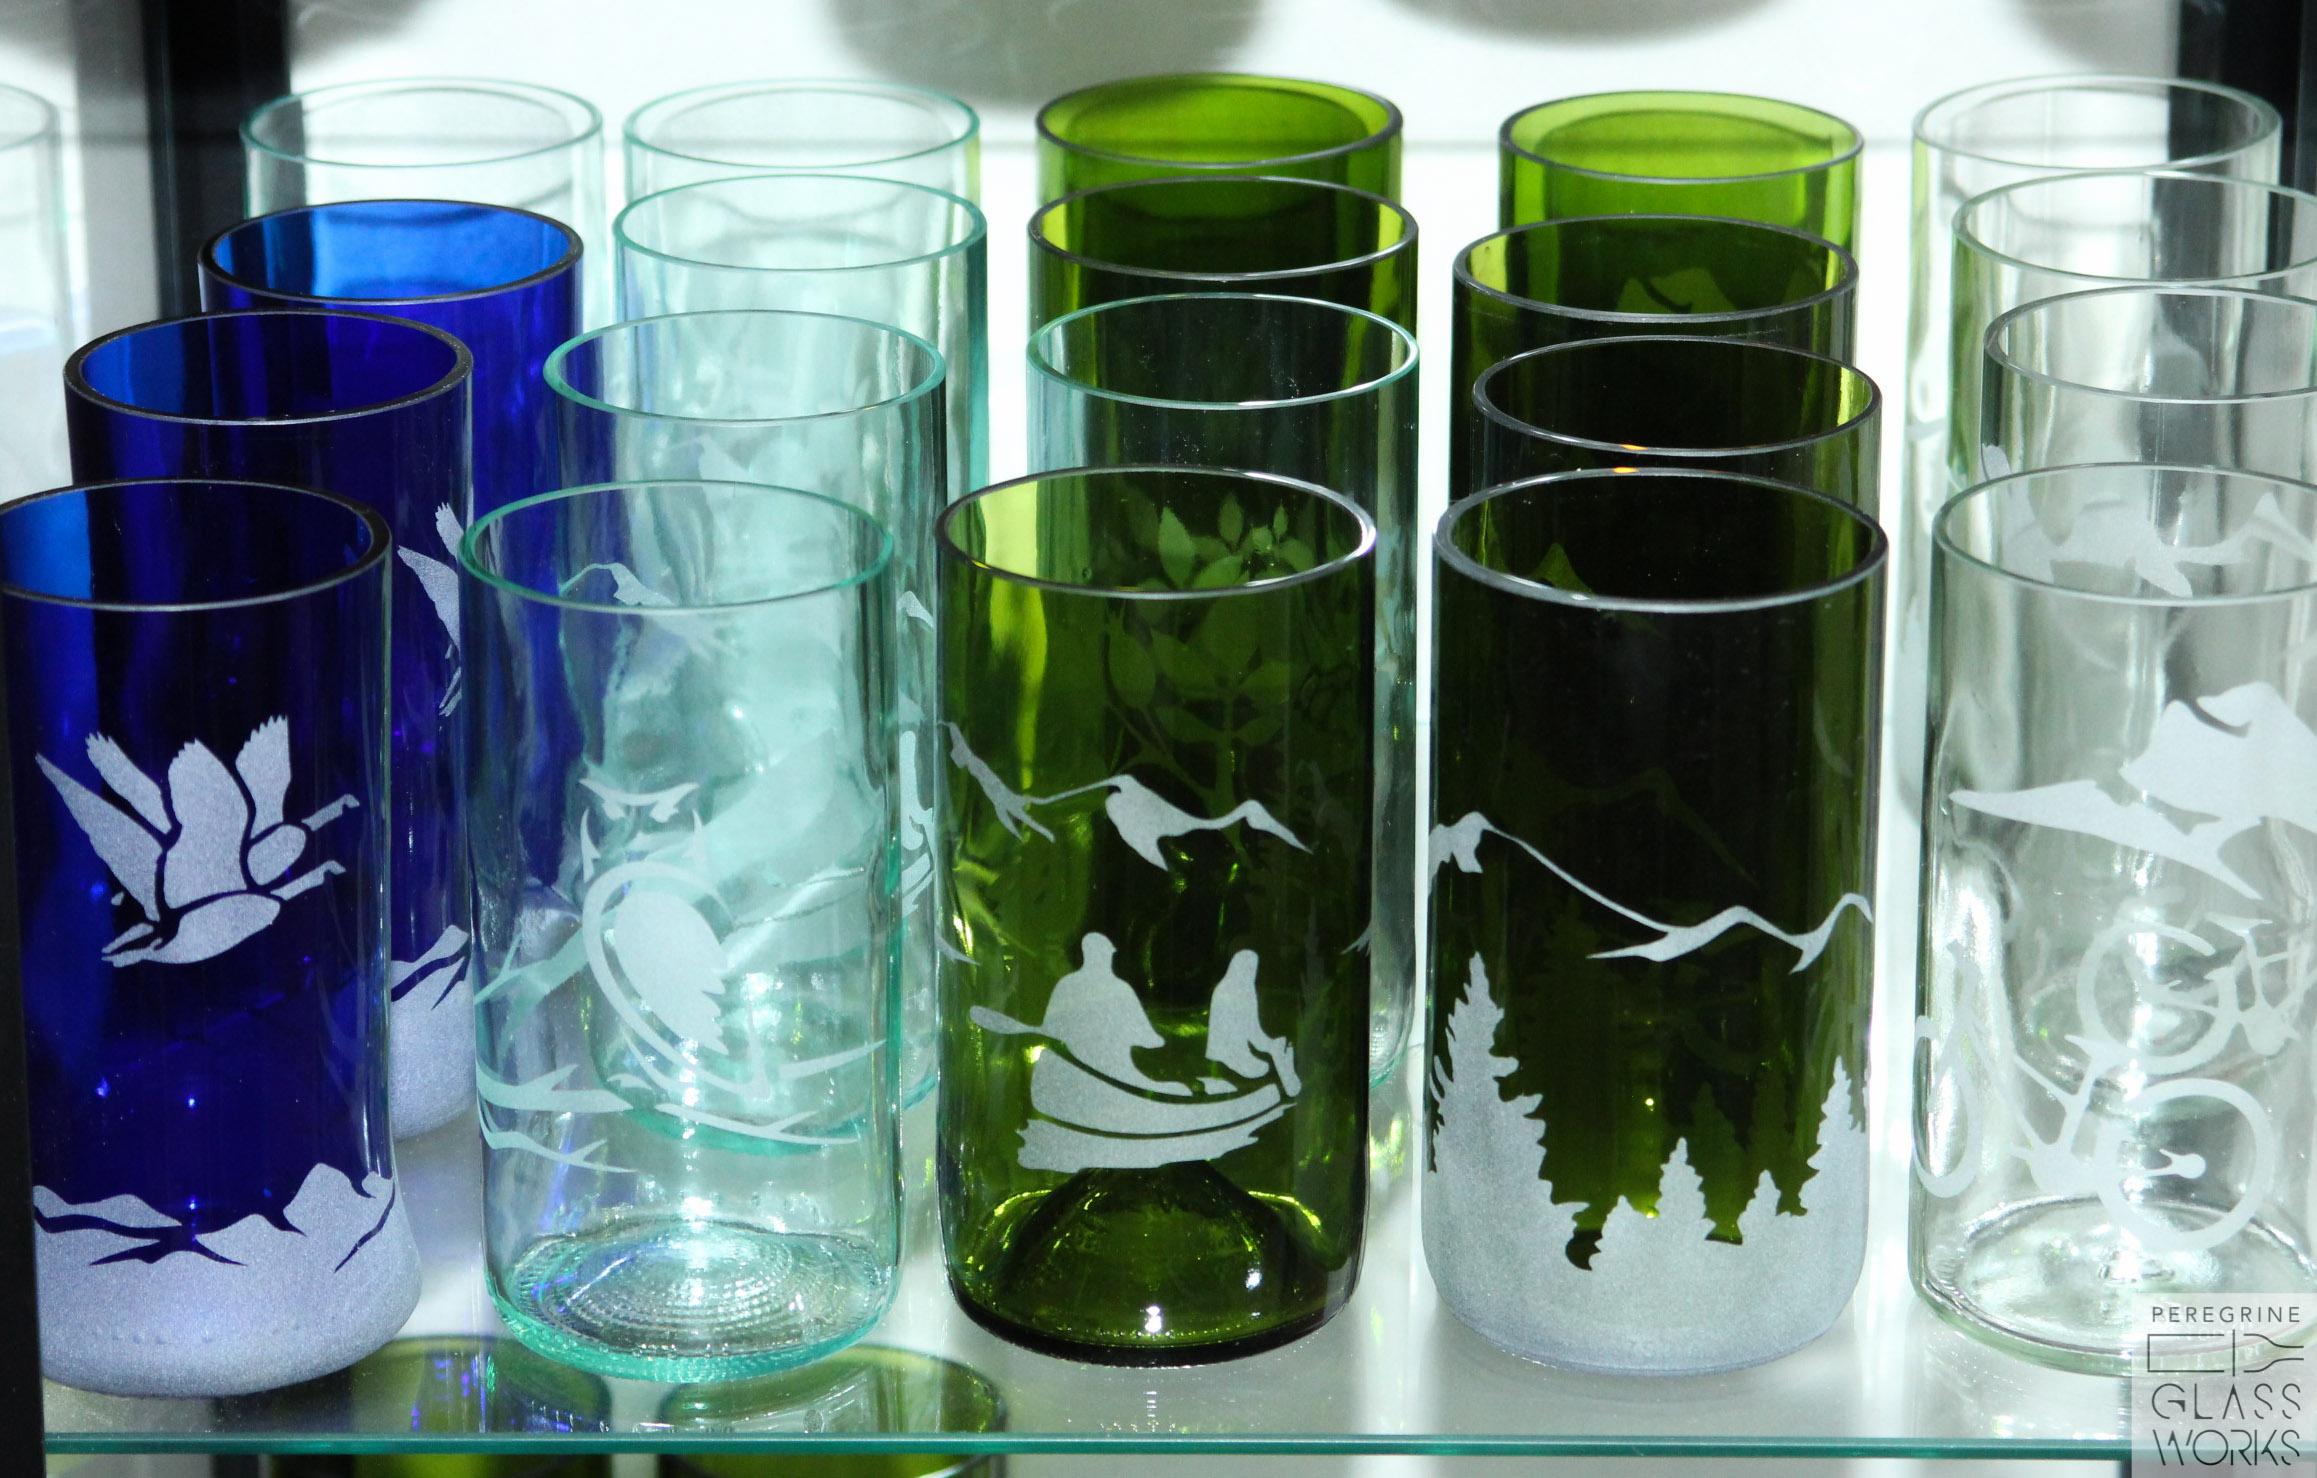 polishedglassesinstock.jpg